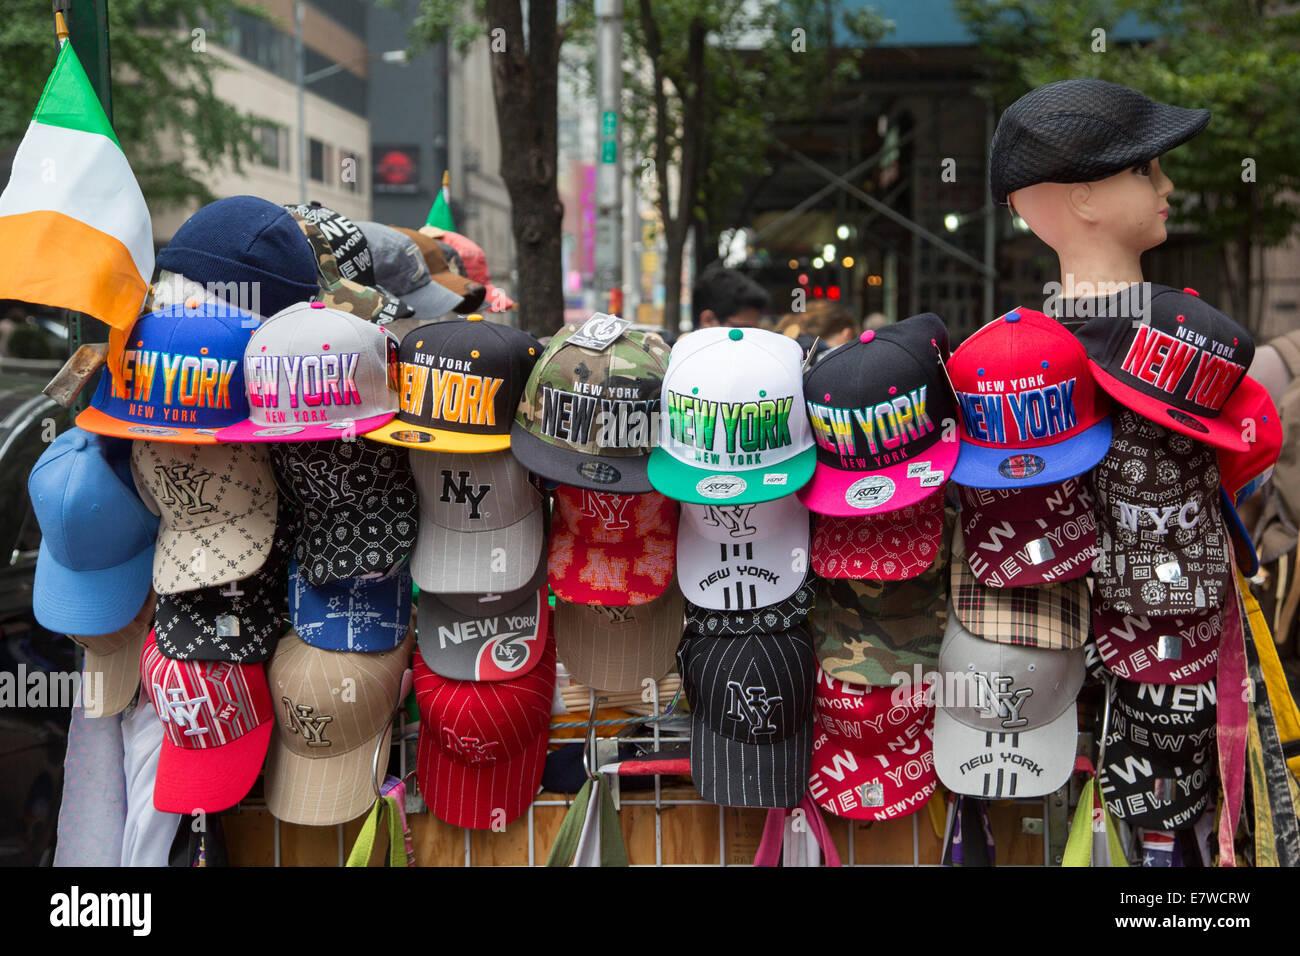 New York, New York - Baseball caps on sale at a street vendor's stall in midtown Manhattan. - Stock Image